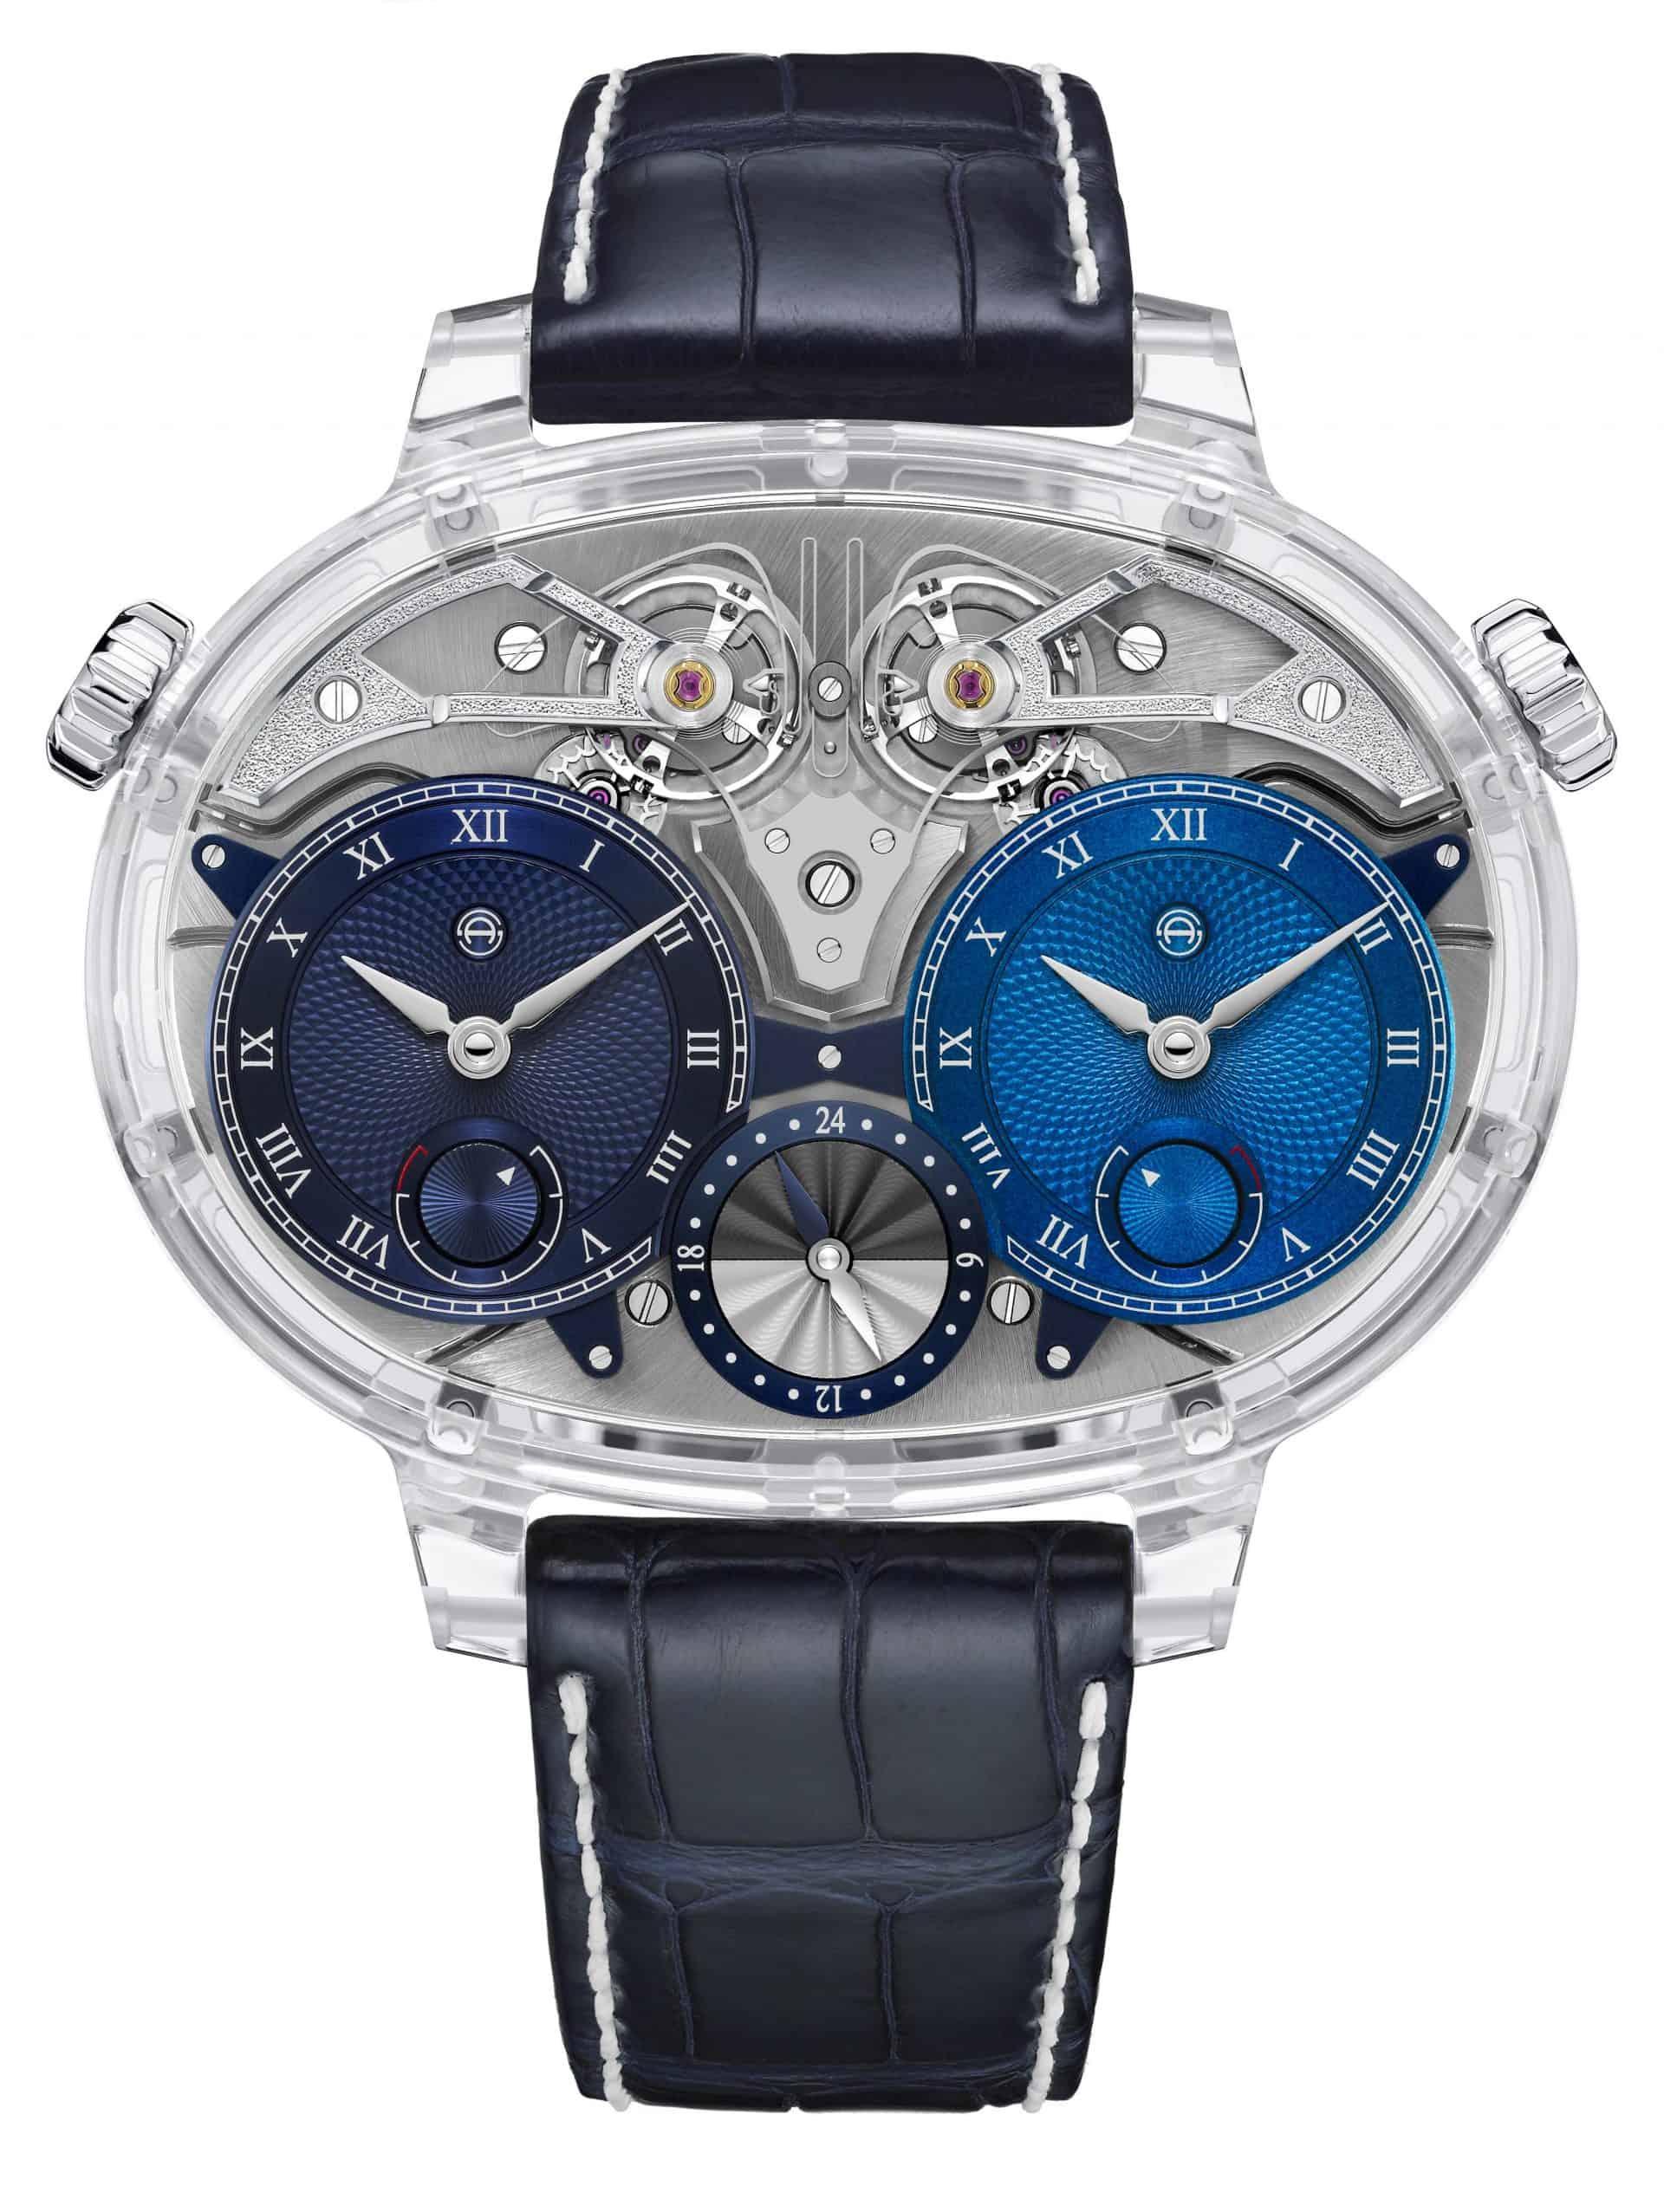 "Armin Stroms Luxus-Armbanduhr ""Dual Time Resonance Sapphire"" bietet hohe Präzisision und TransparenzIm Doppelpack: Armin Strom Dual Time Resonance Sapphire"